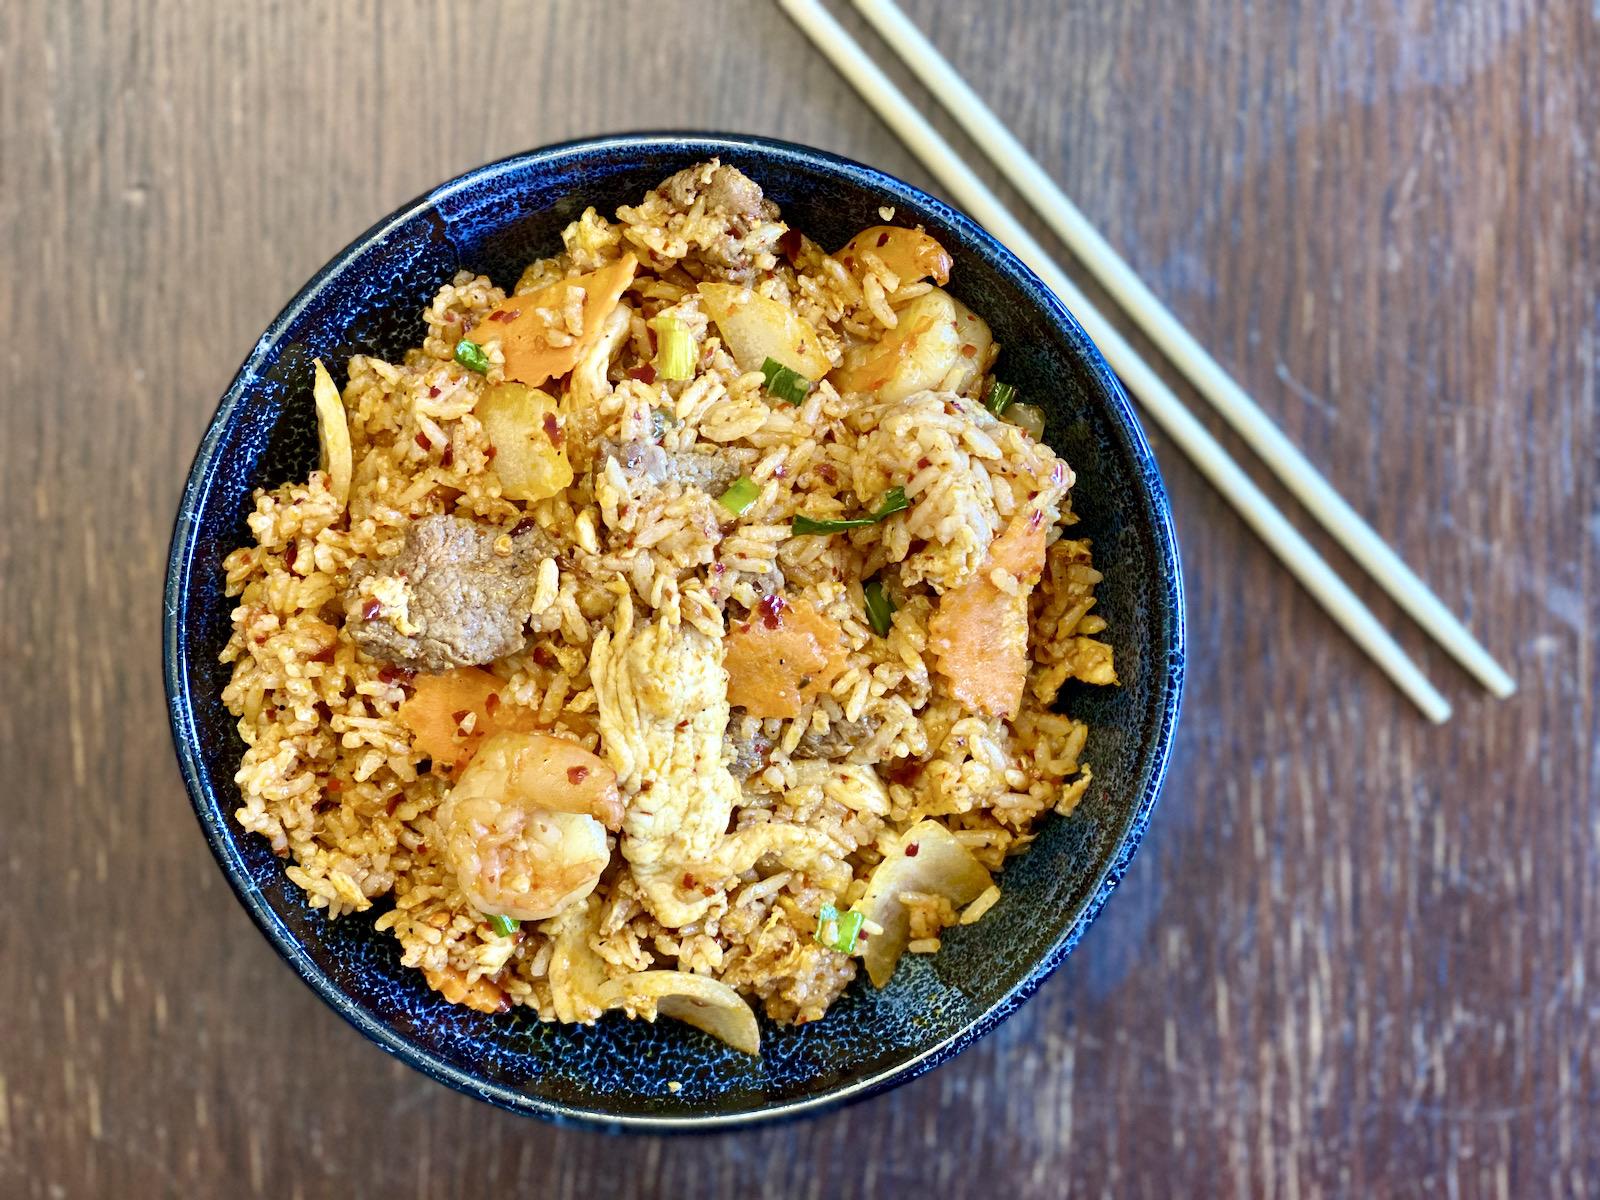 Jeow bong fried rice